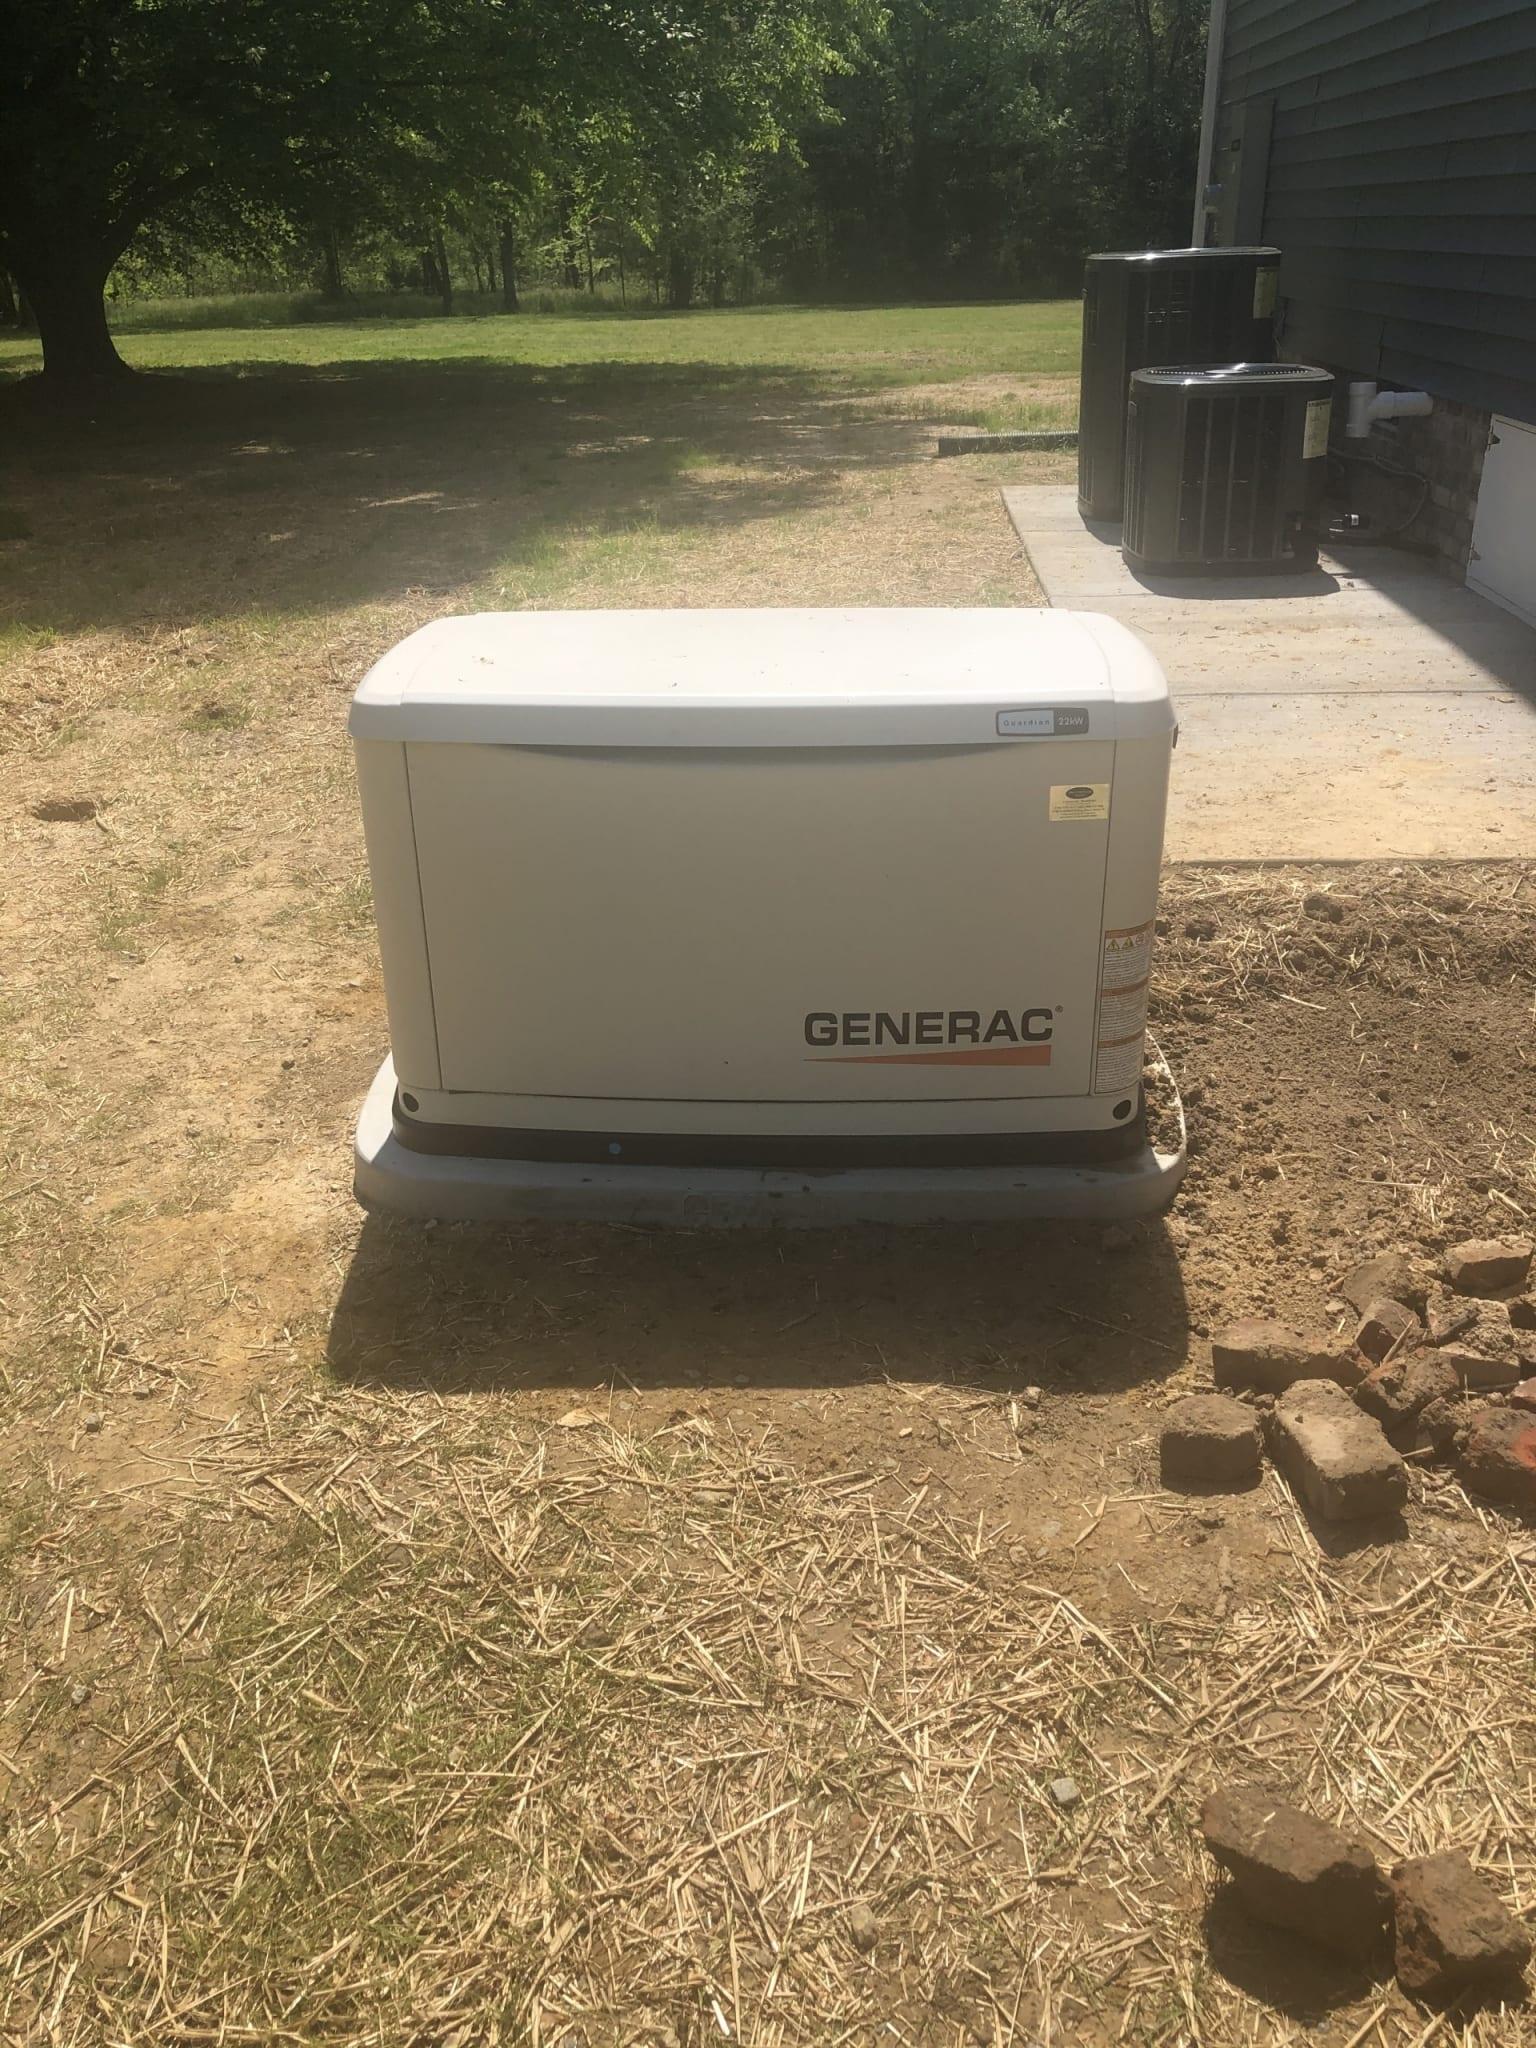 4.21.21 Prince George Generac Automatic Standby Generator